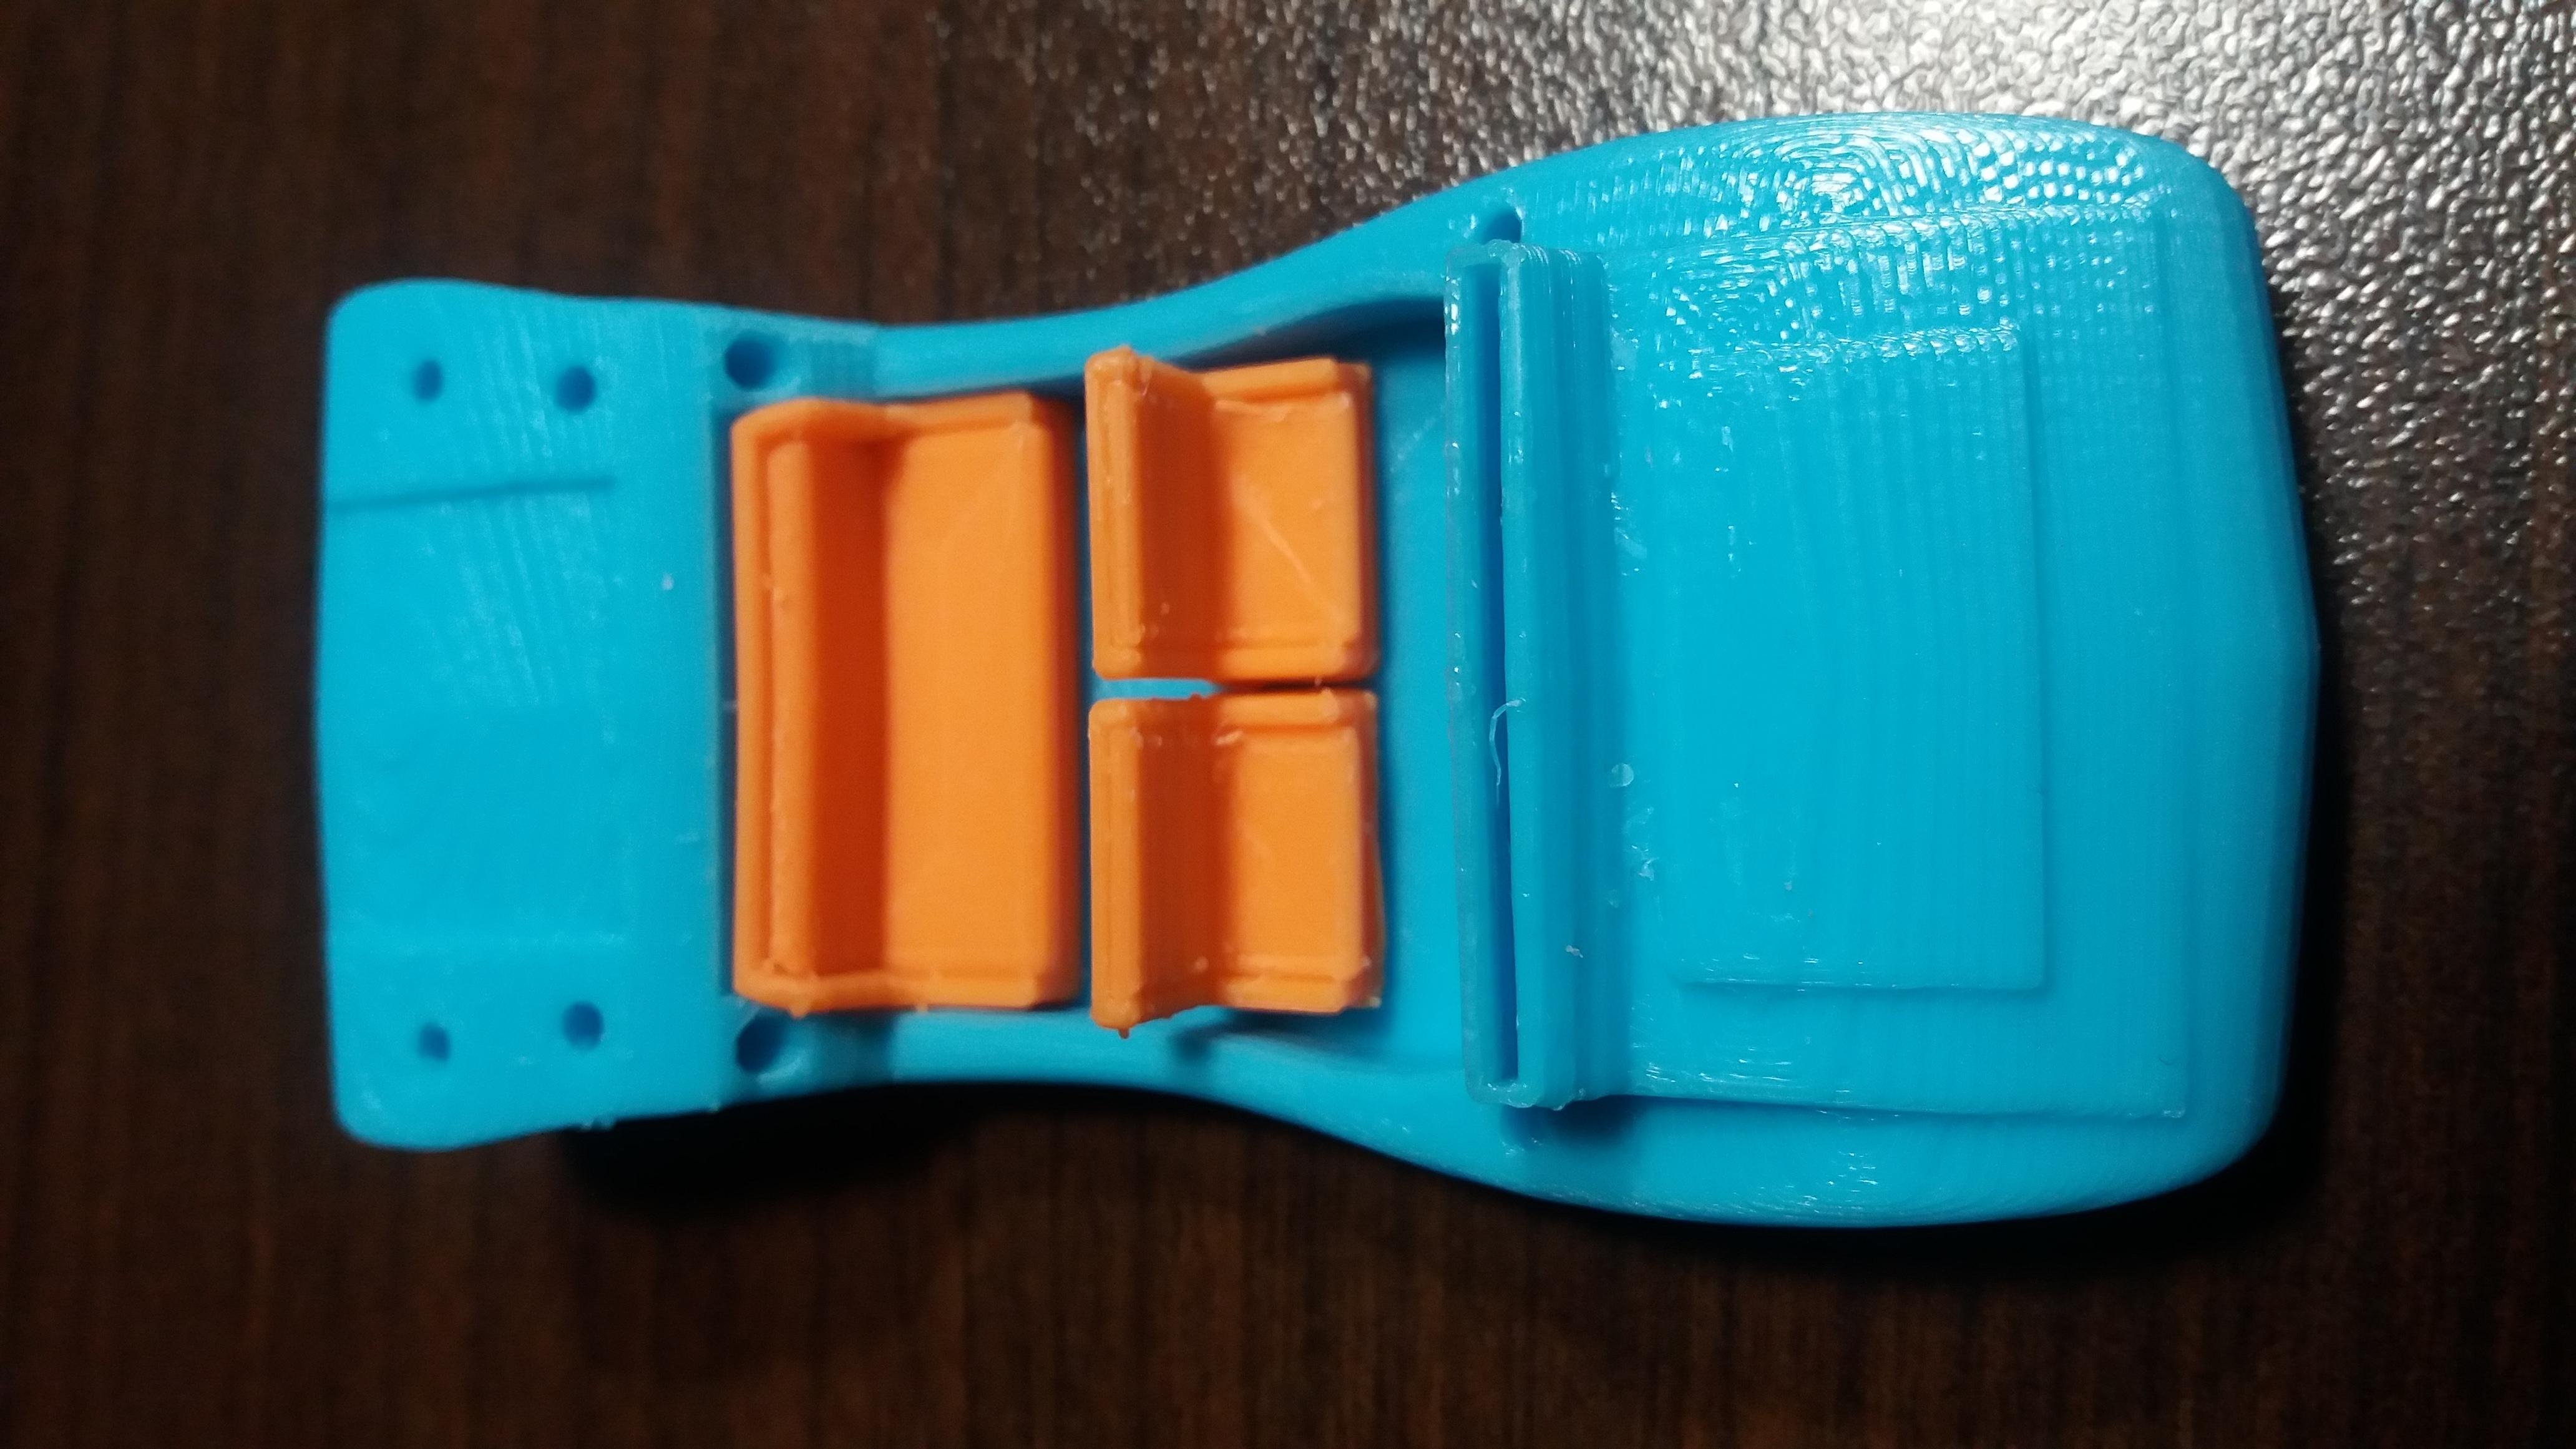 20180406_214402.jpg Télécharger fichier STL  Buggy,  • Plan imprimable en 3D, gerbat